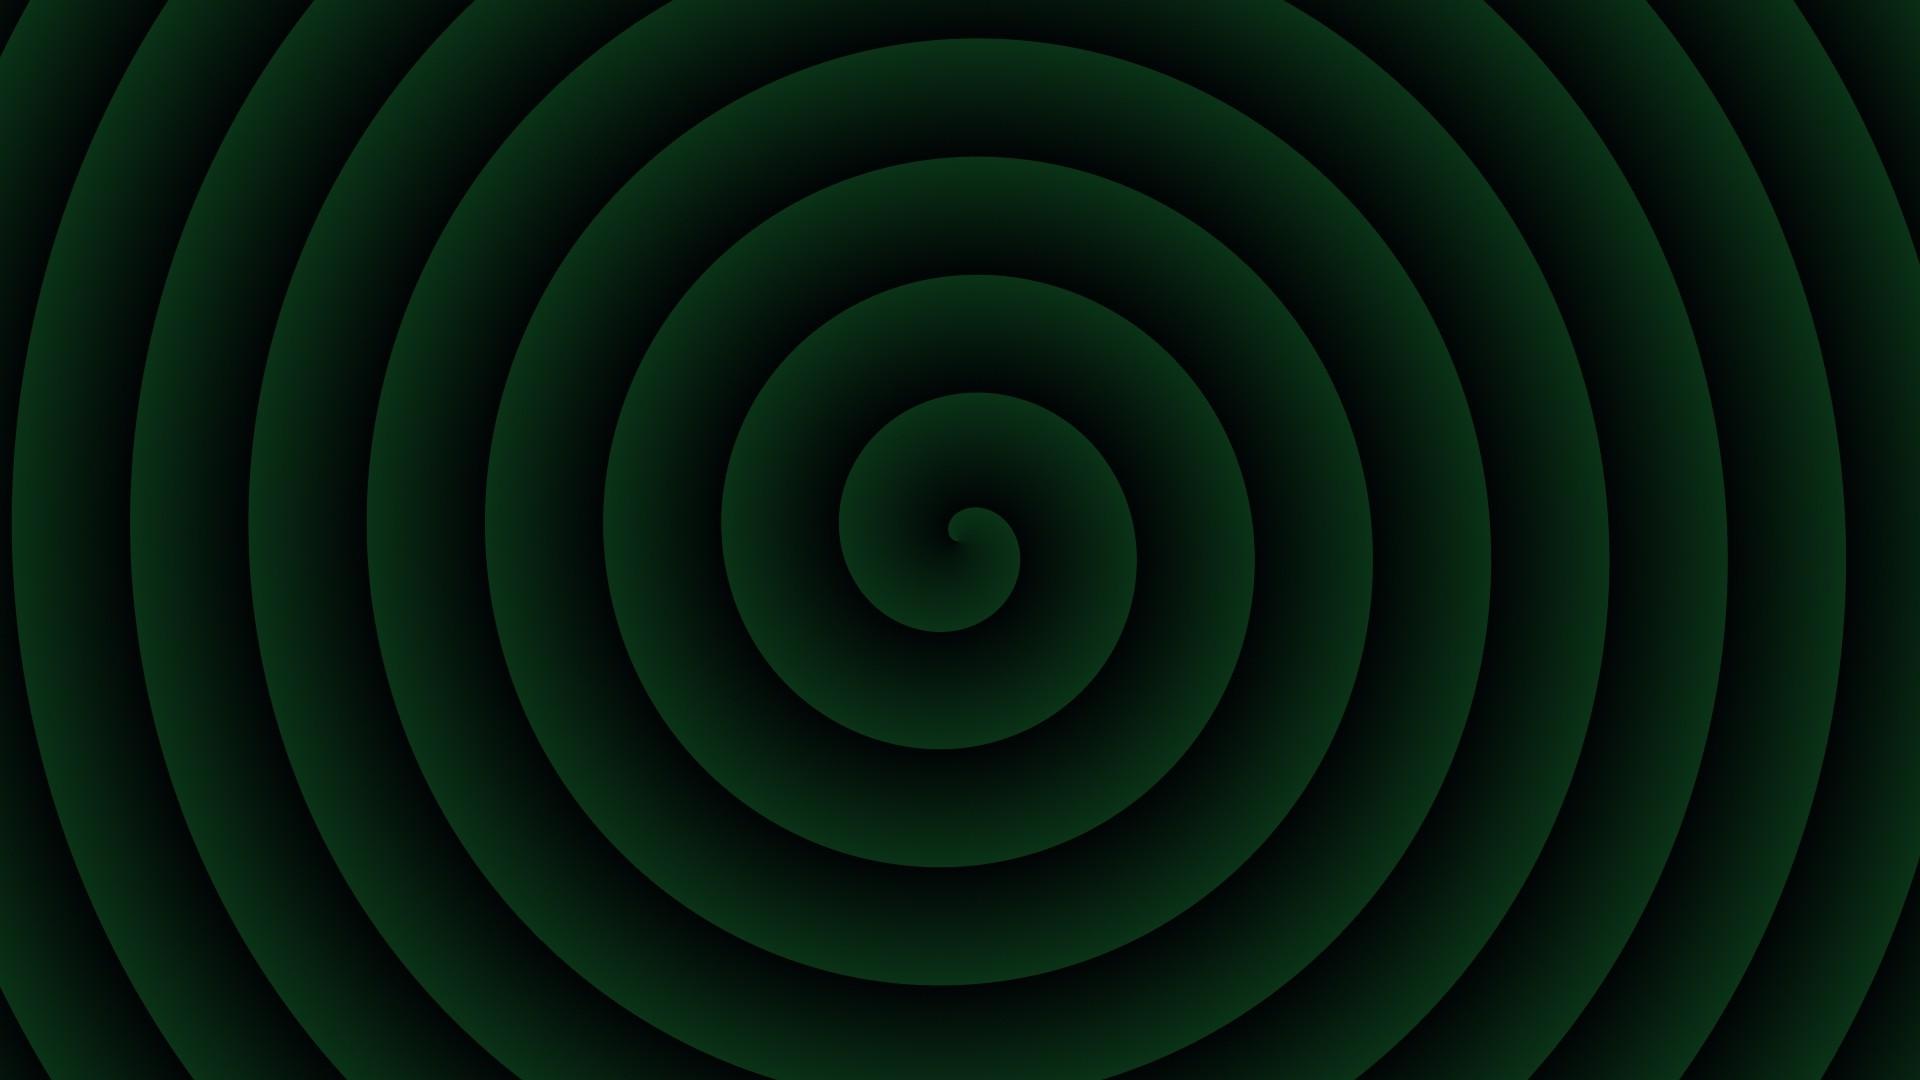 abstract green spiral wallpaper 62286